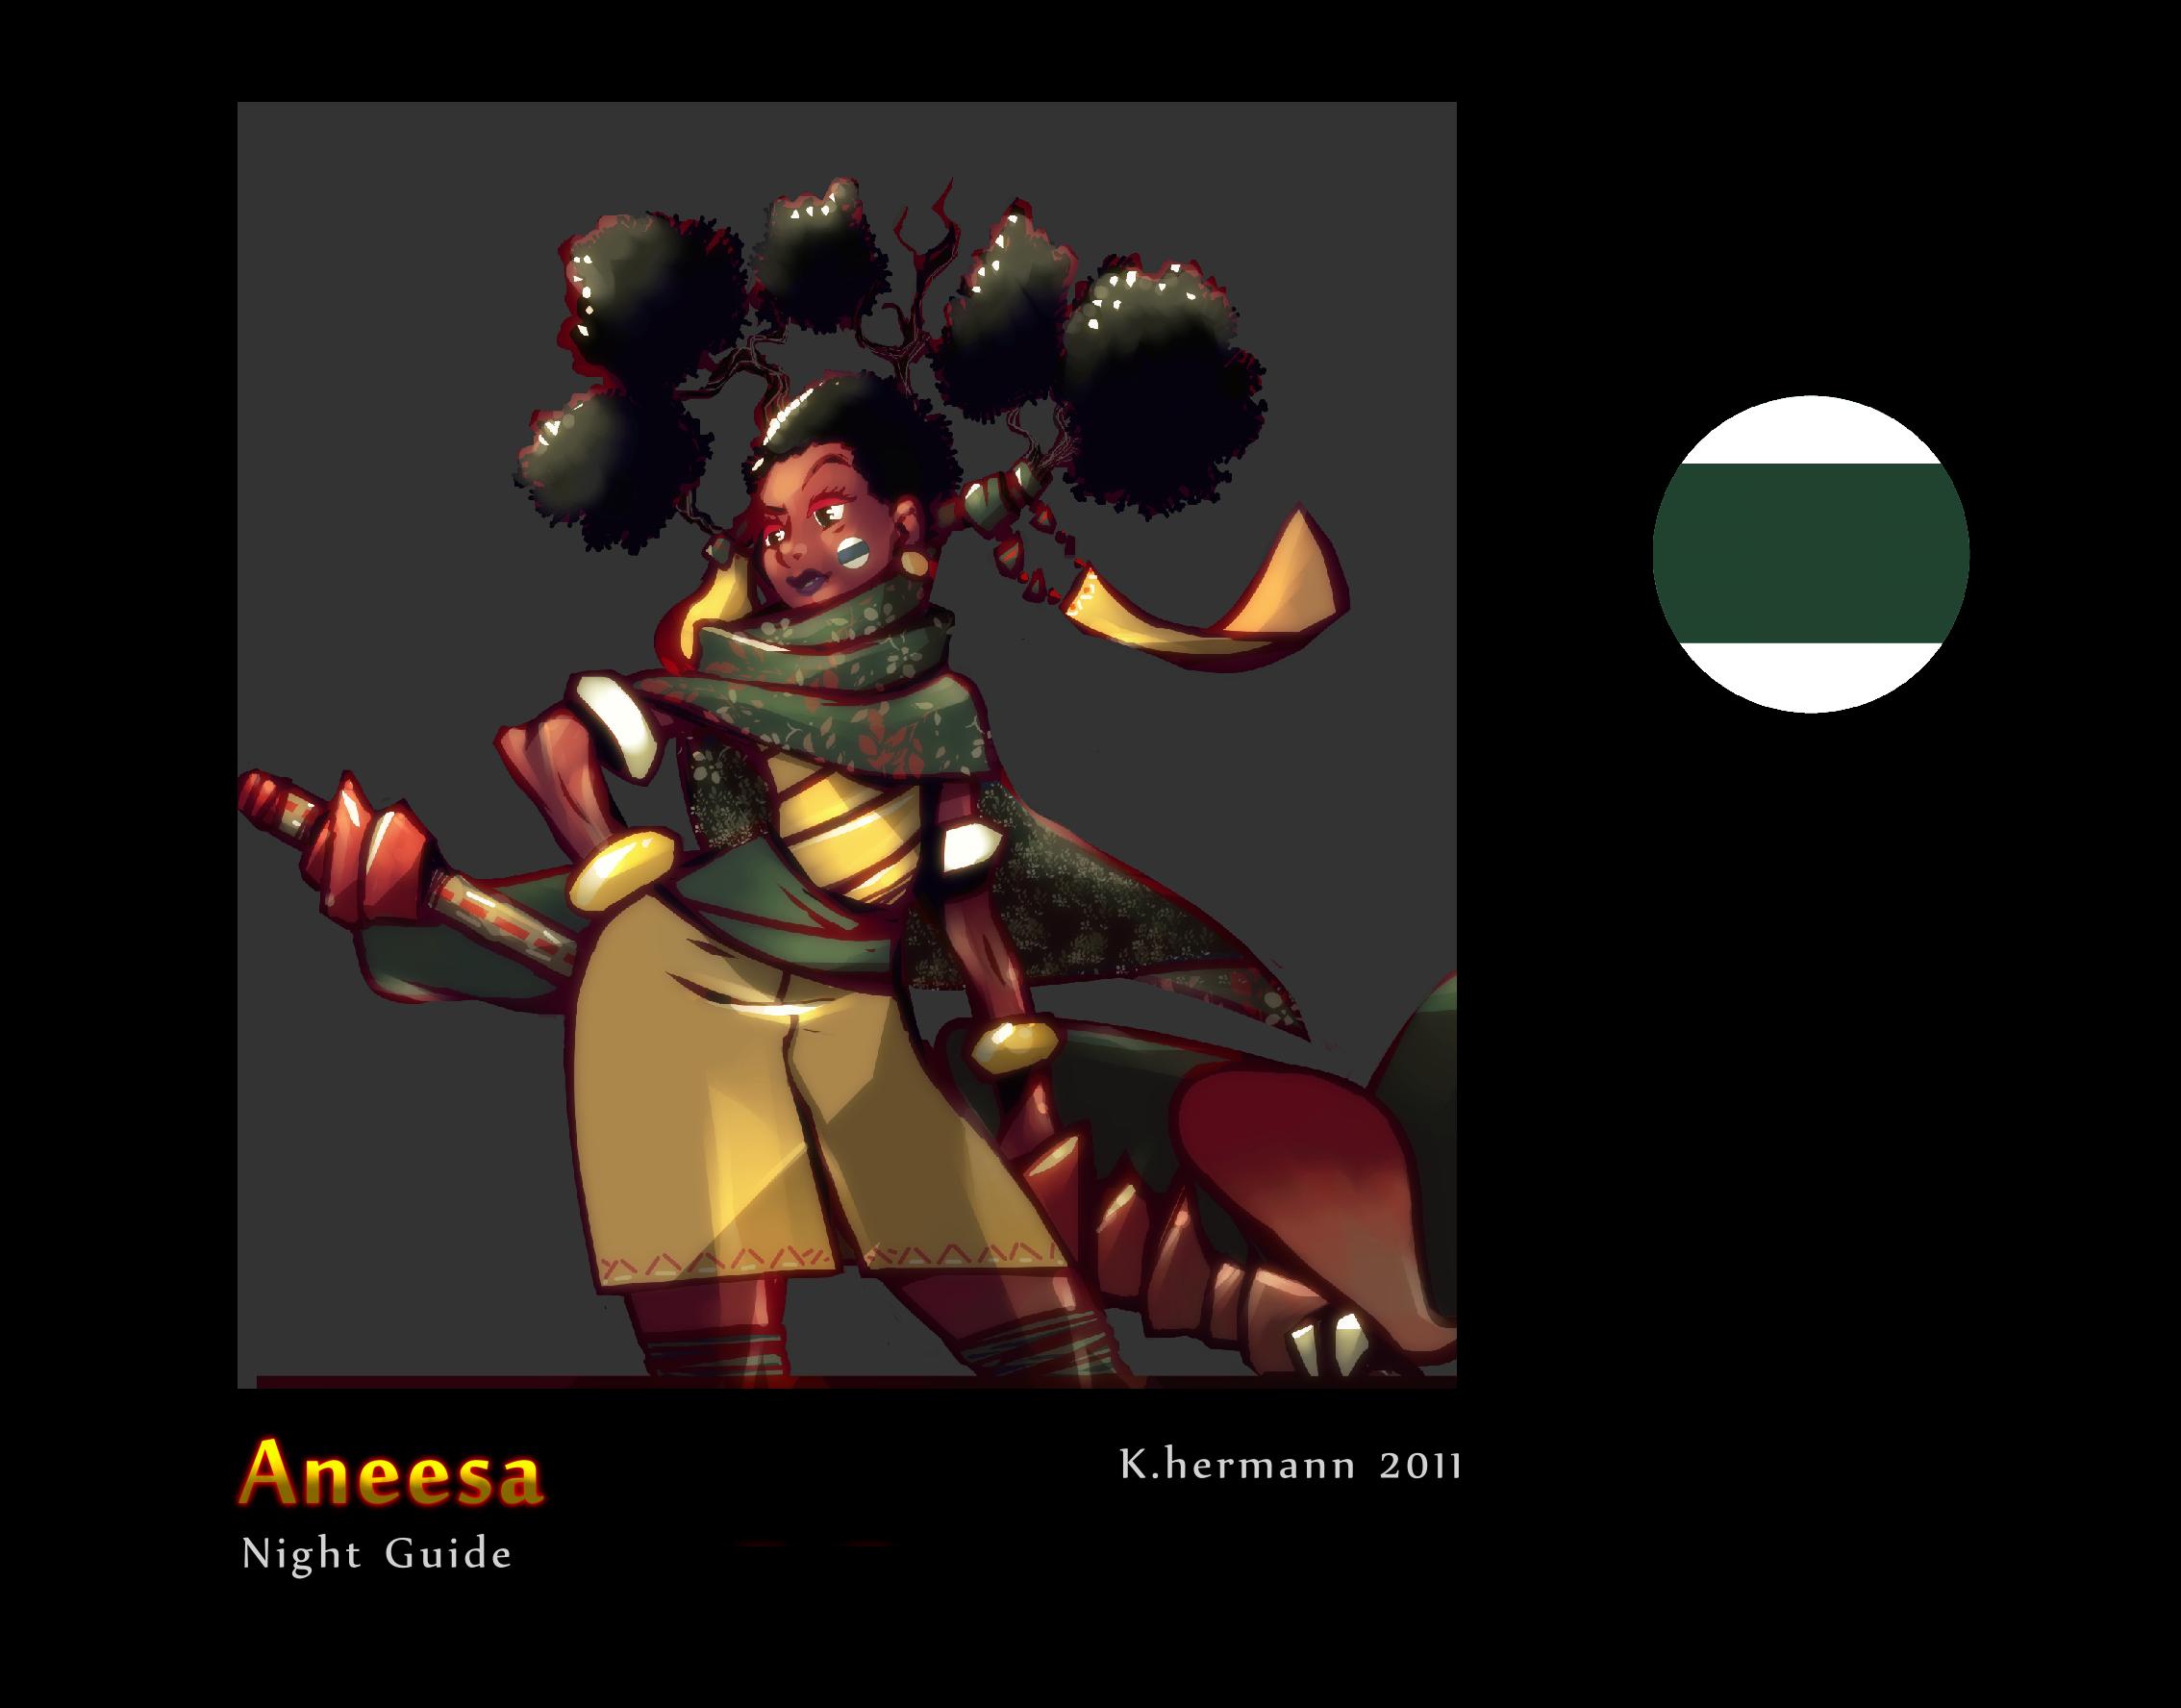 Aneesa the night guide